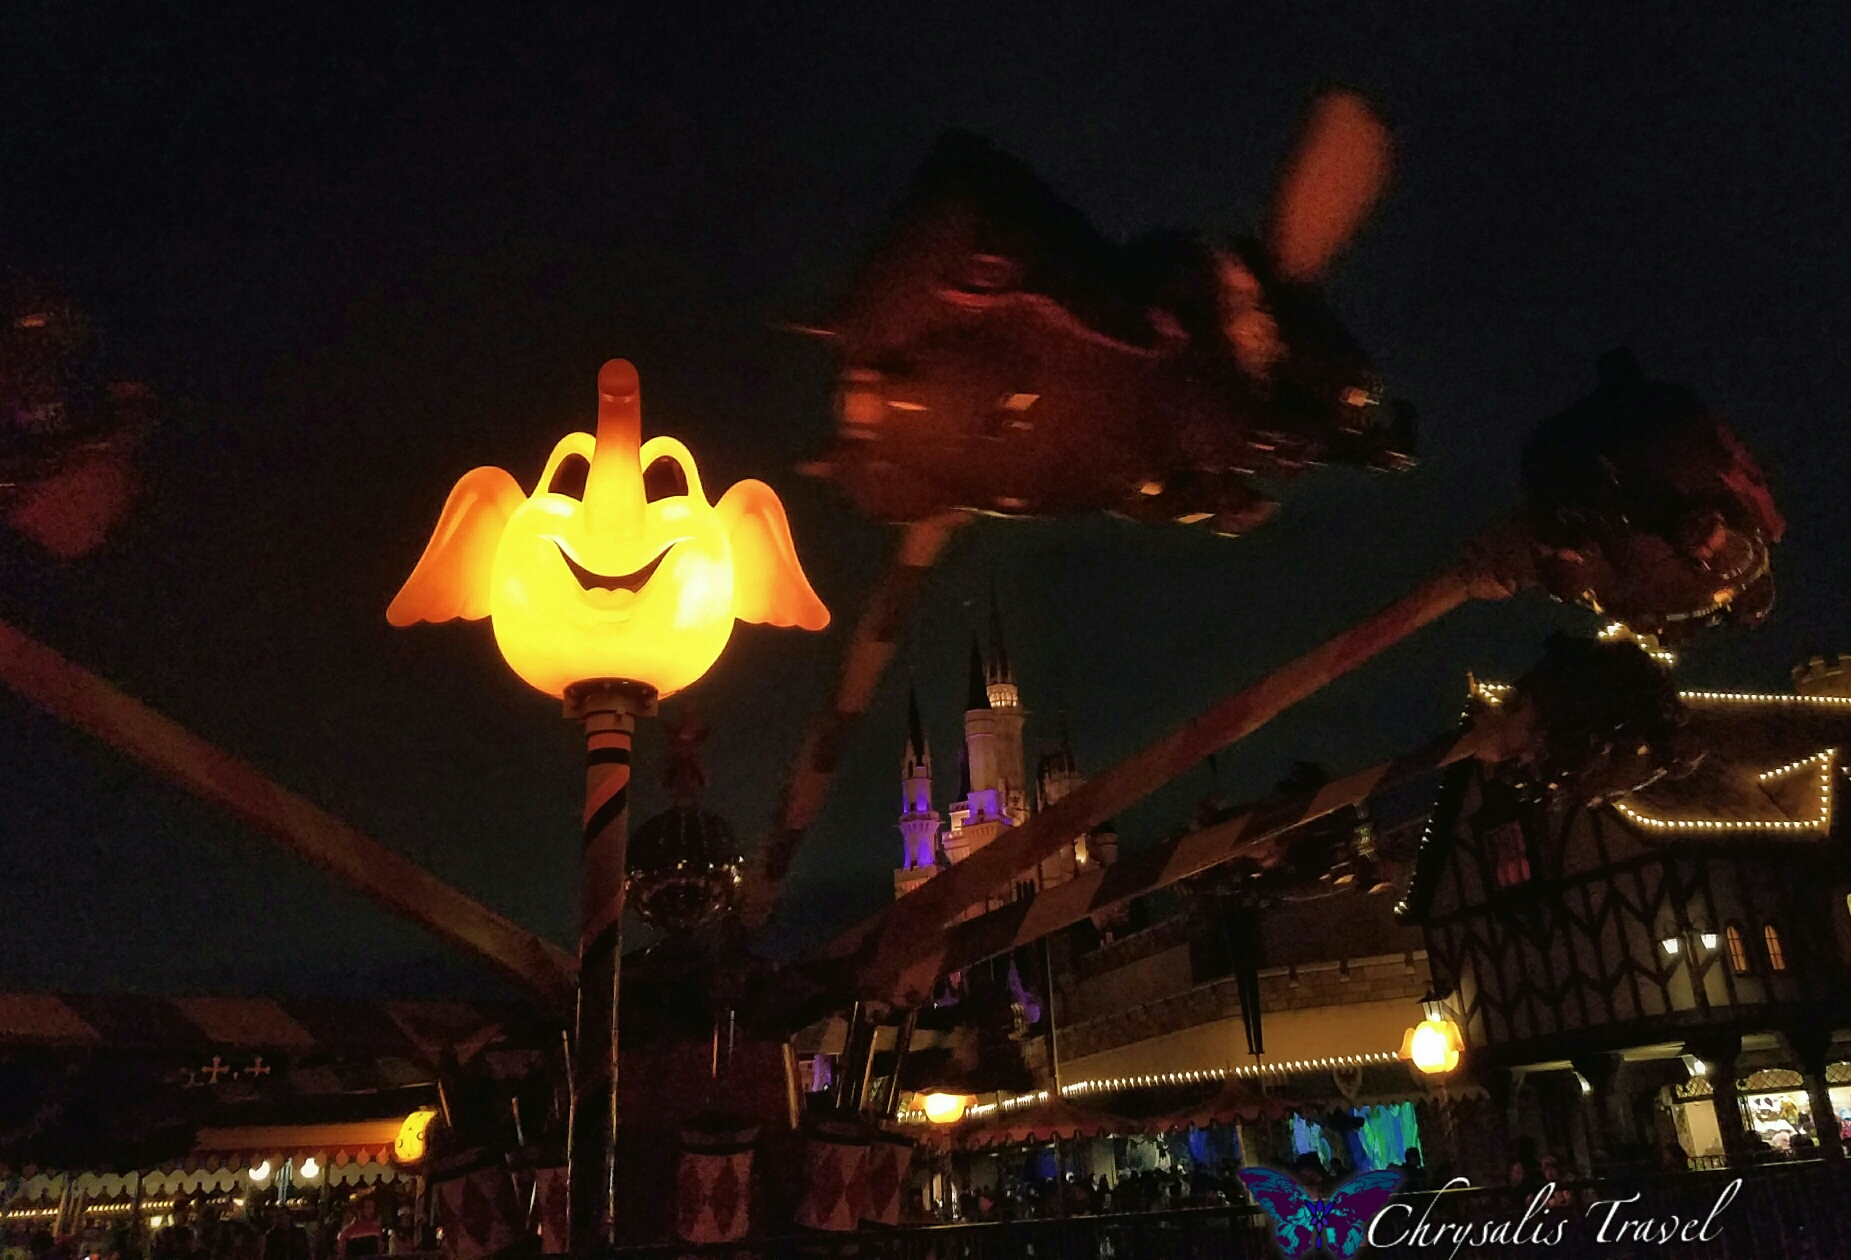 elephant-pumpkins-at-dumbo